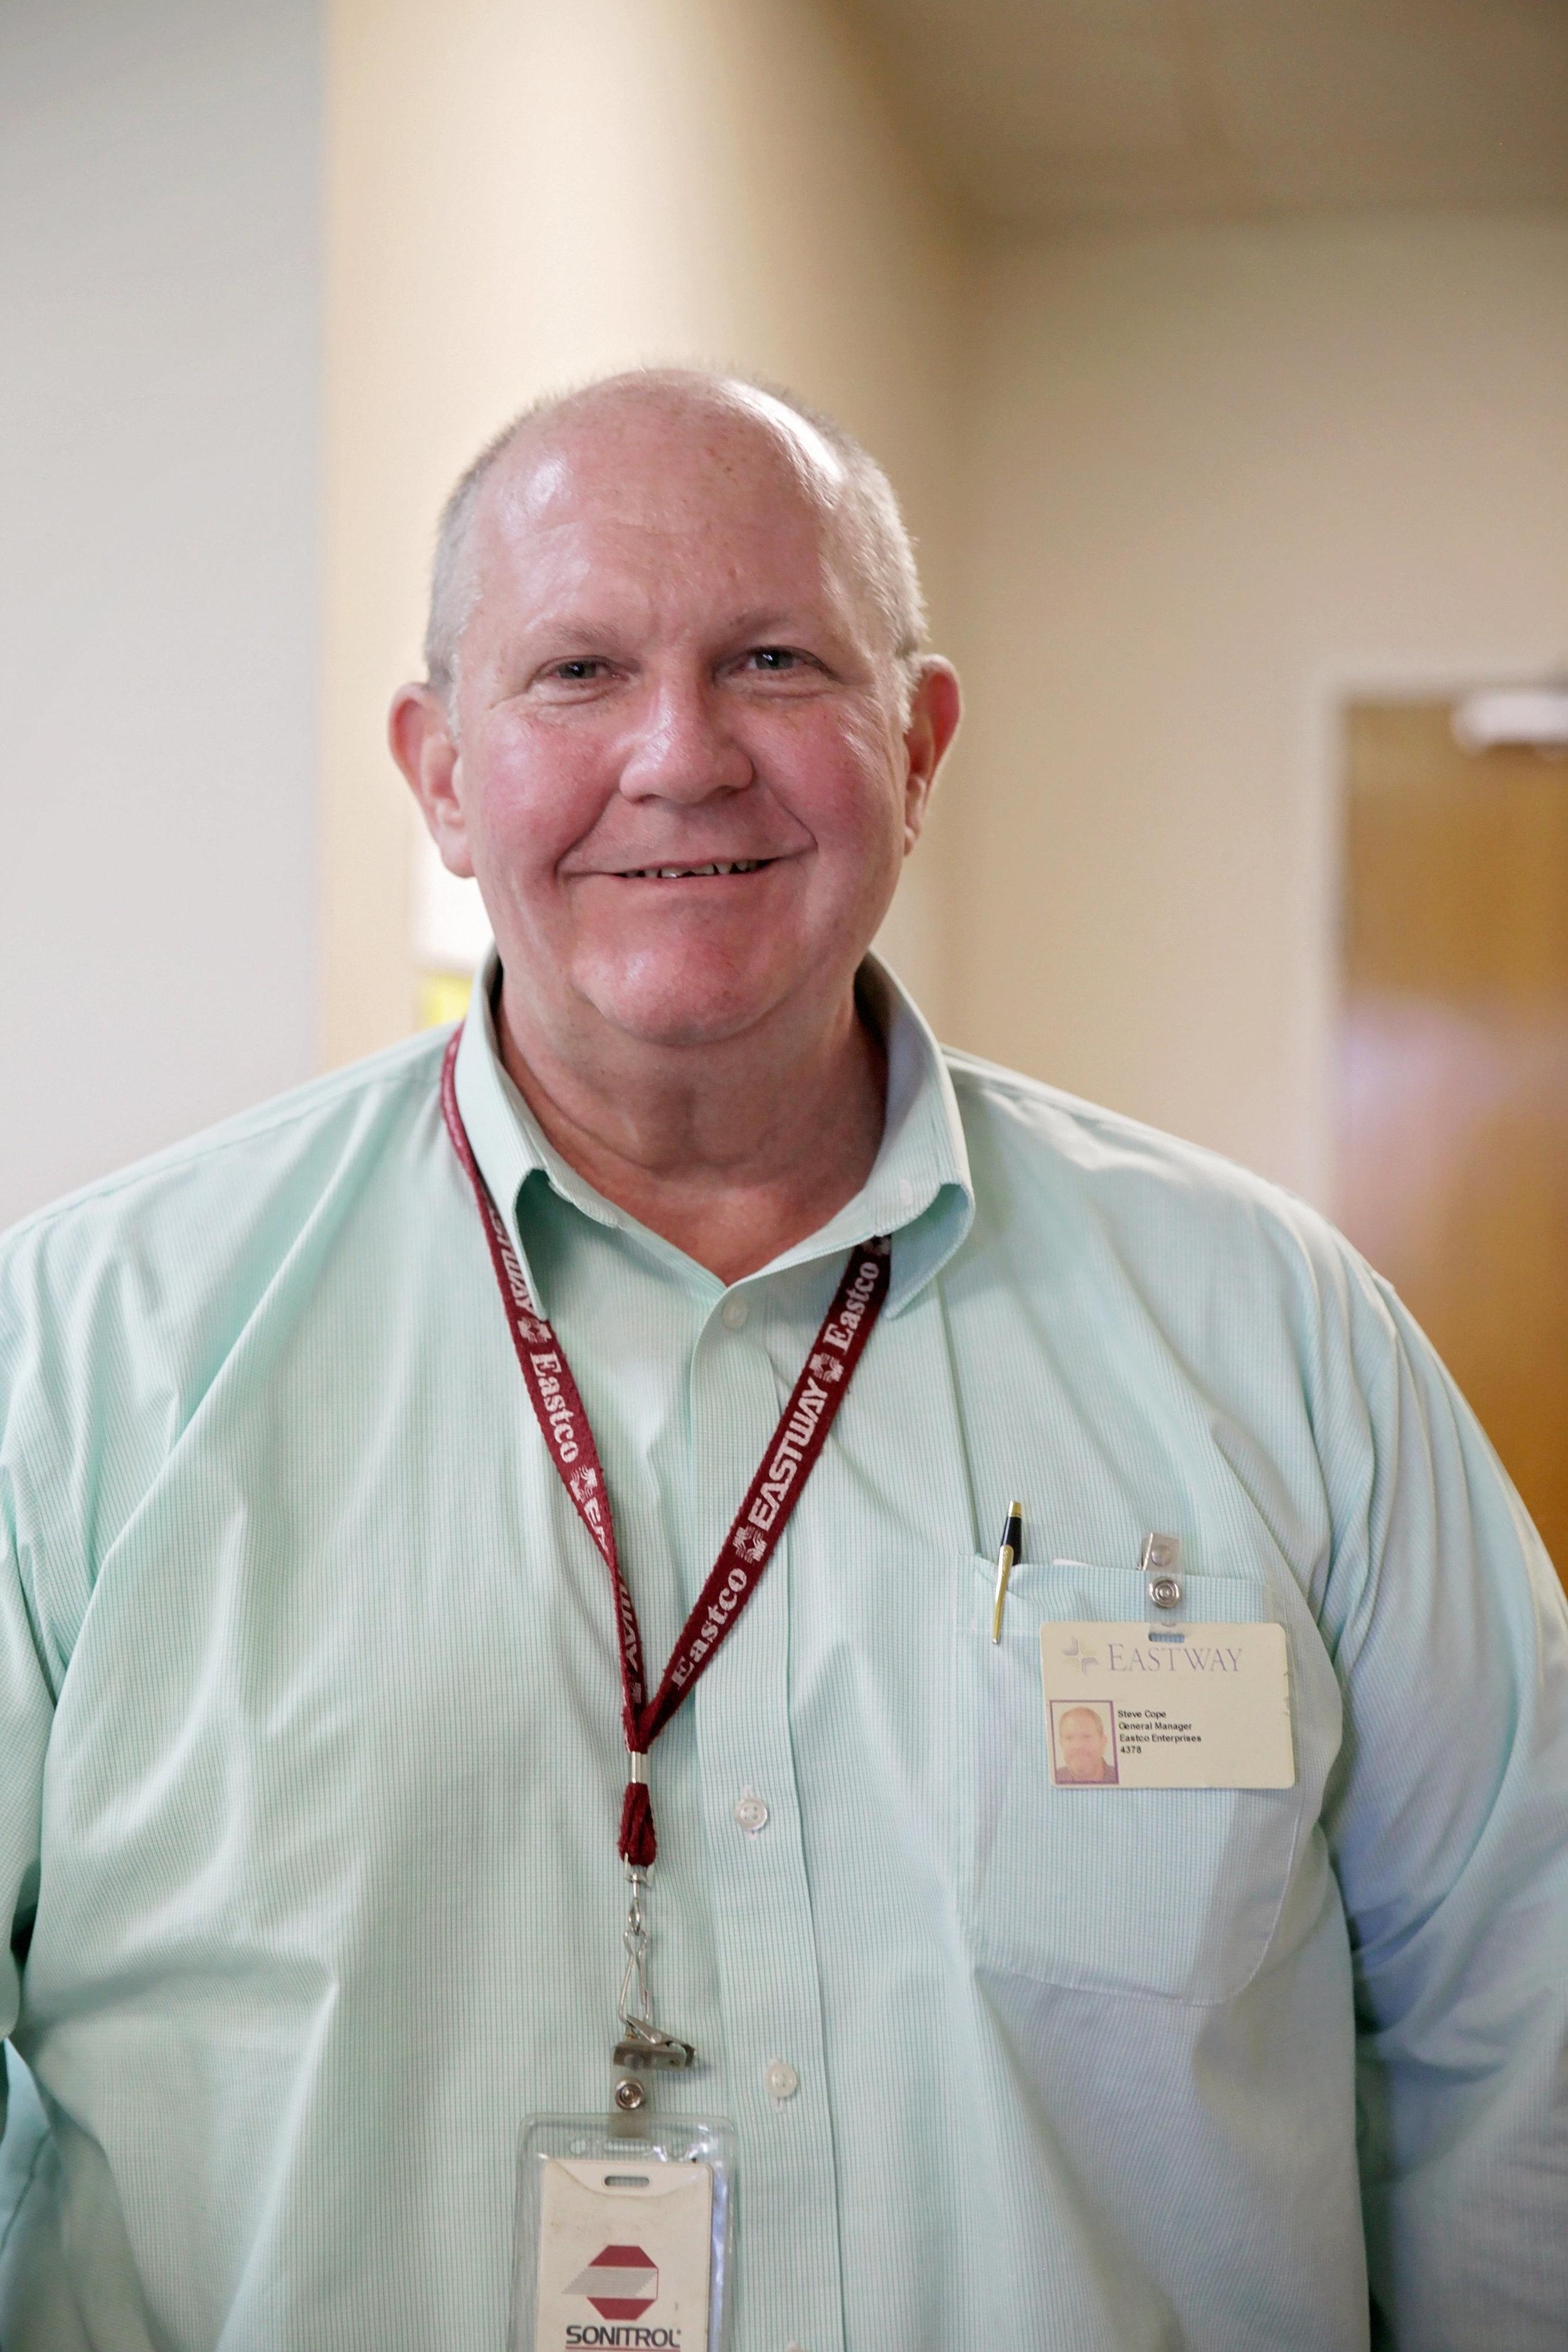 Director at  Eastco Enterprises  in Dayton, Ohio